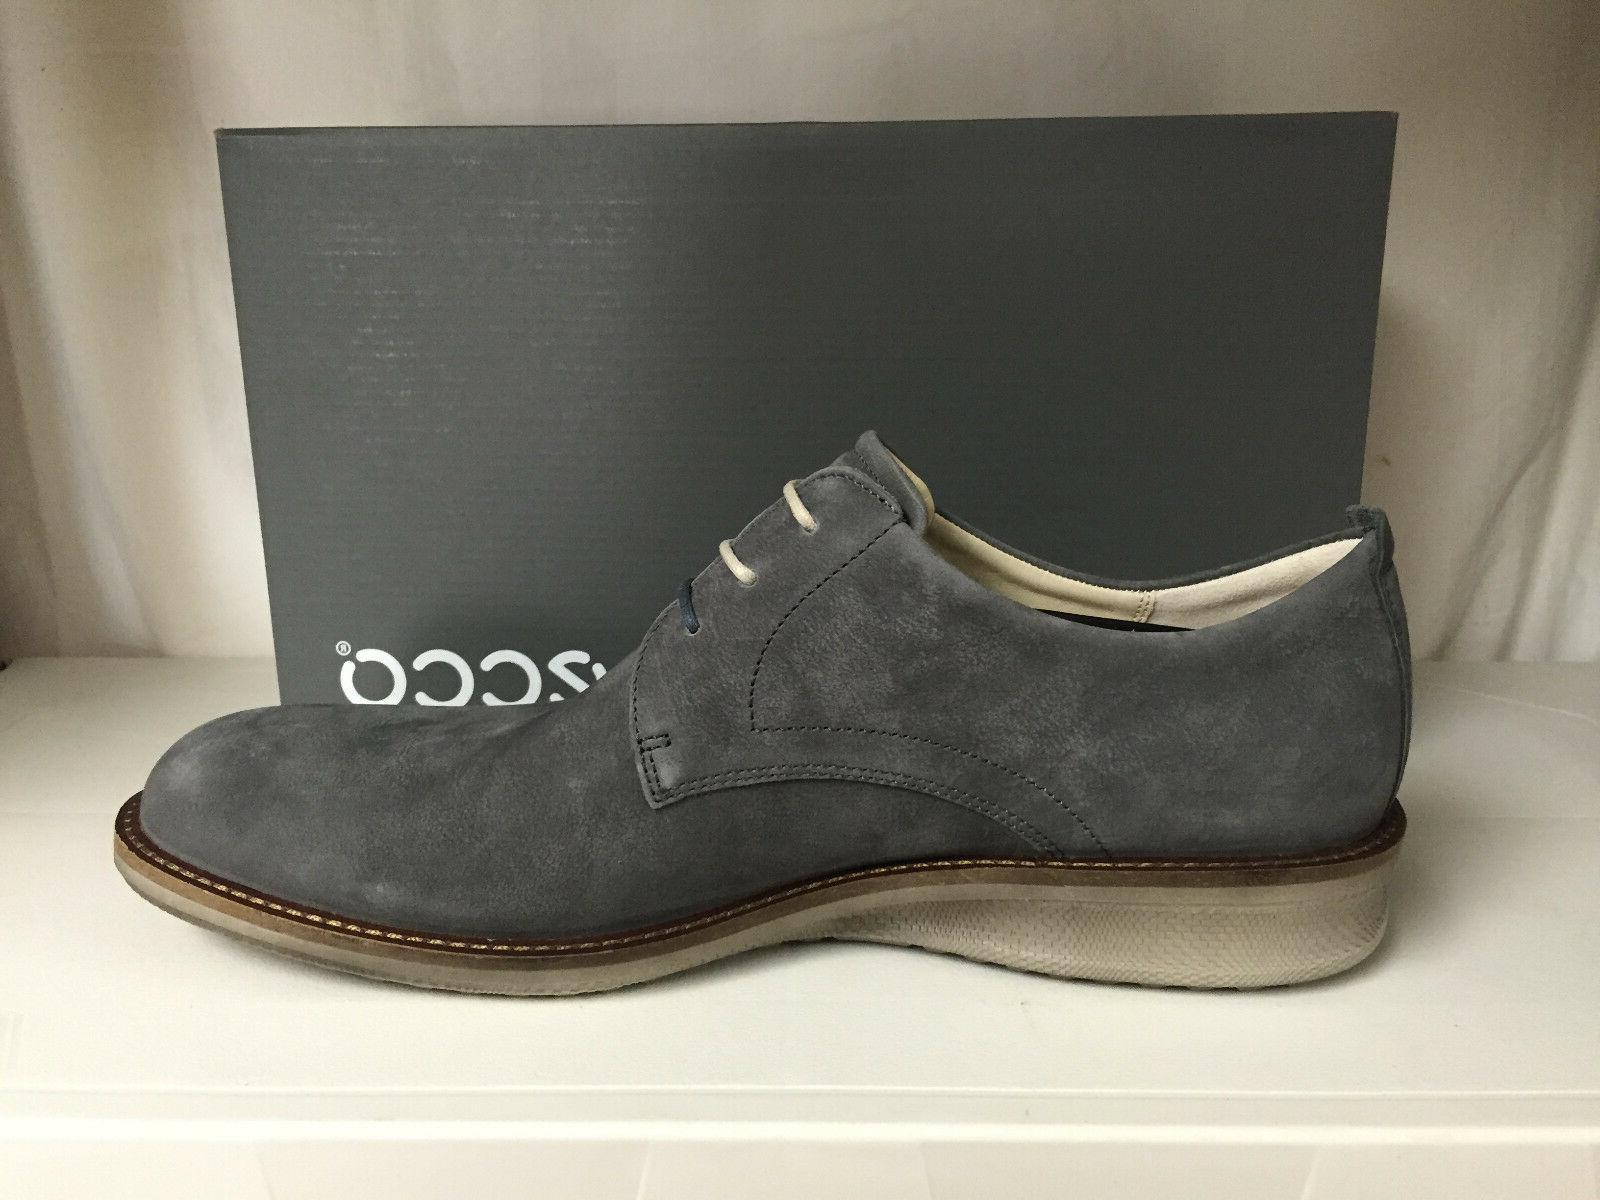 Ecco Contoured Men's Toe Oxfords Leather Dress